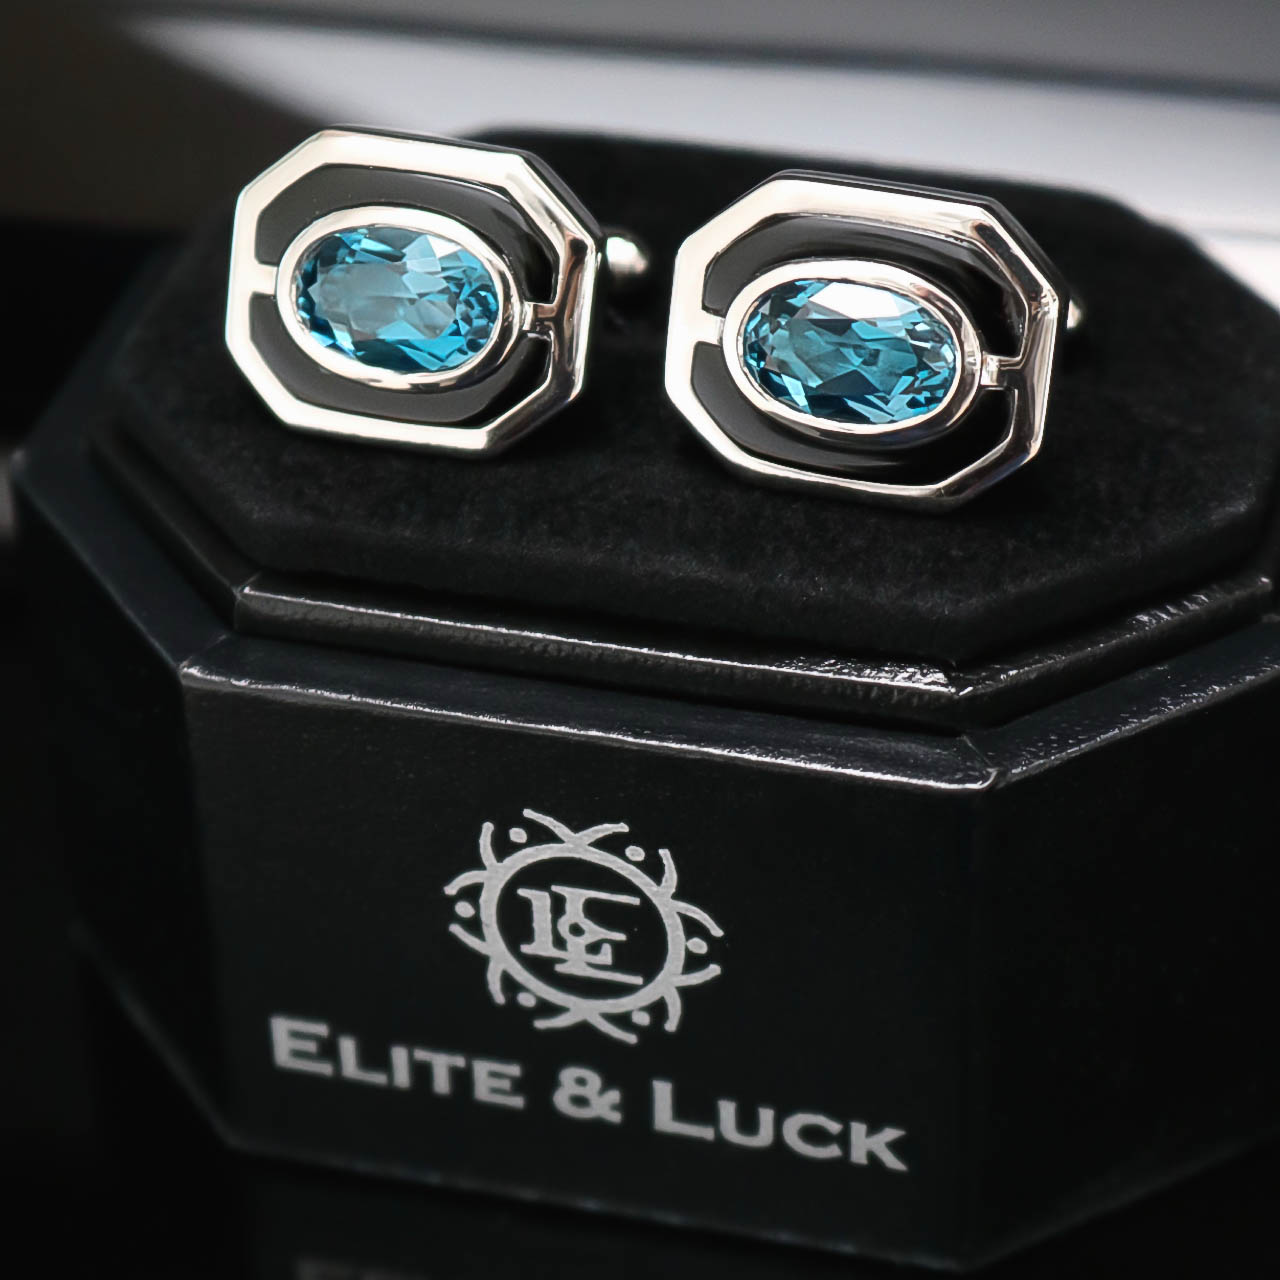 Elite & Luck แหวนและ Cufflinks ใน Luxury Lifestyle Magazine เดือนกรกฏาคม 2017.